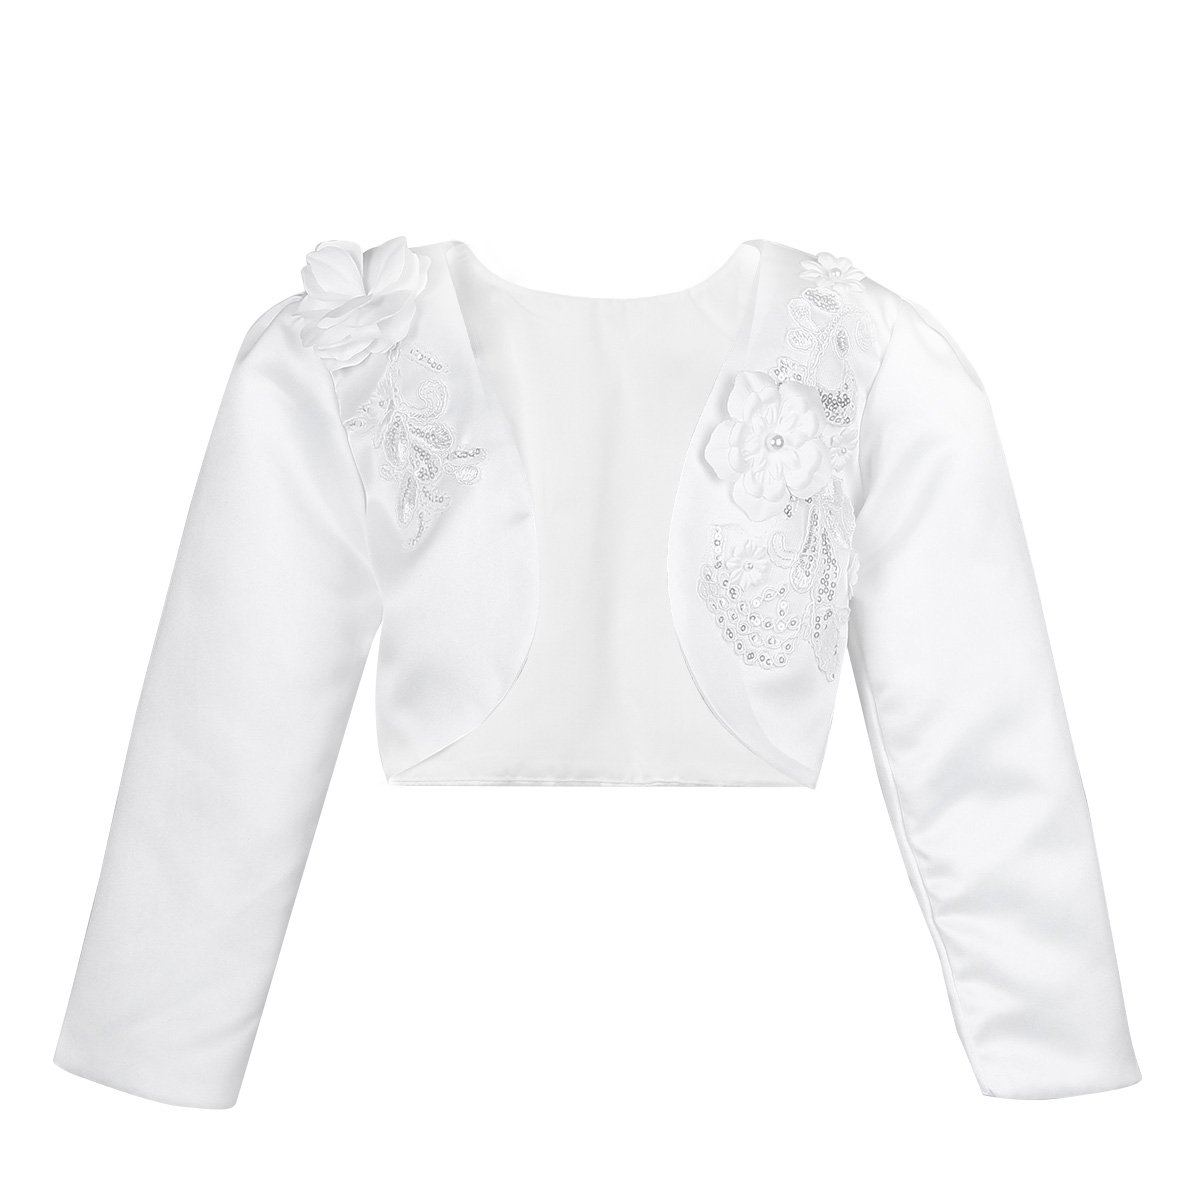 FEESHOW Kids Girls Long Sleeve Satin Bolero Shrug Jacket Short Cardigan Wedding Flower Girl Dress Cover up Sequin White 5-6